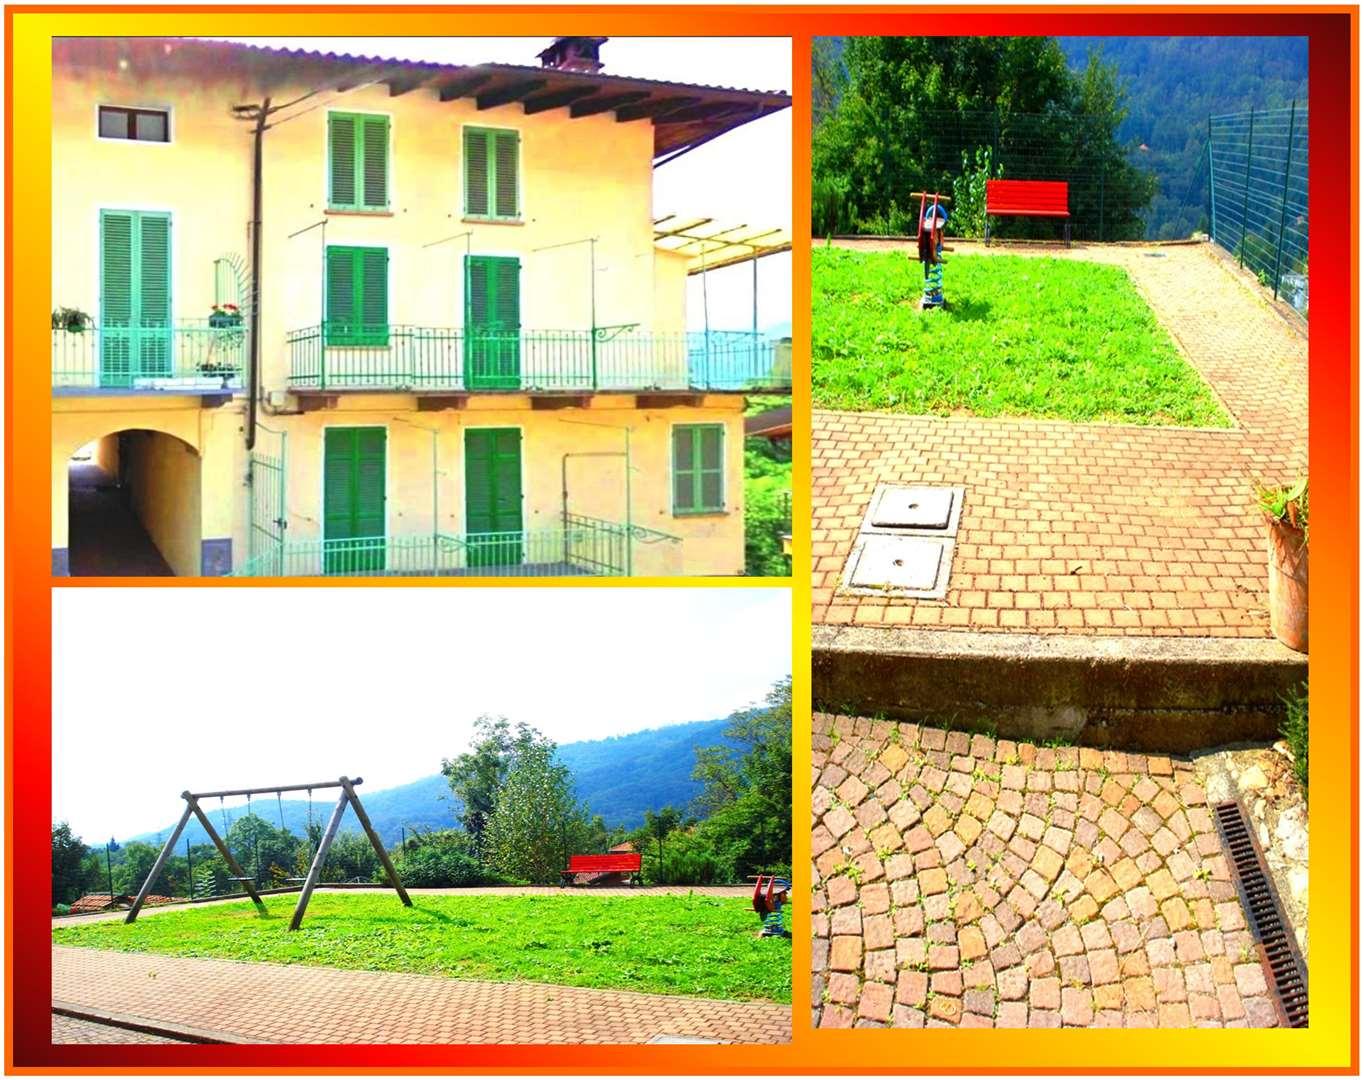 Penthouse 4 Rooms In Italy -  Turinפנטהאוז  4 חדרים באיטליה  - טורינו